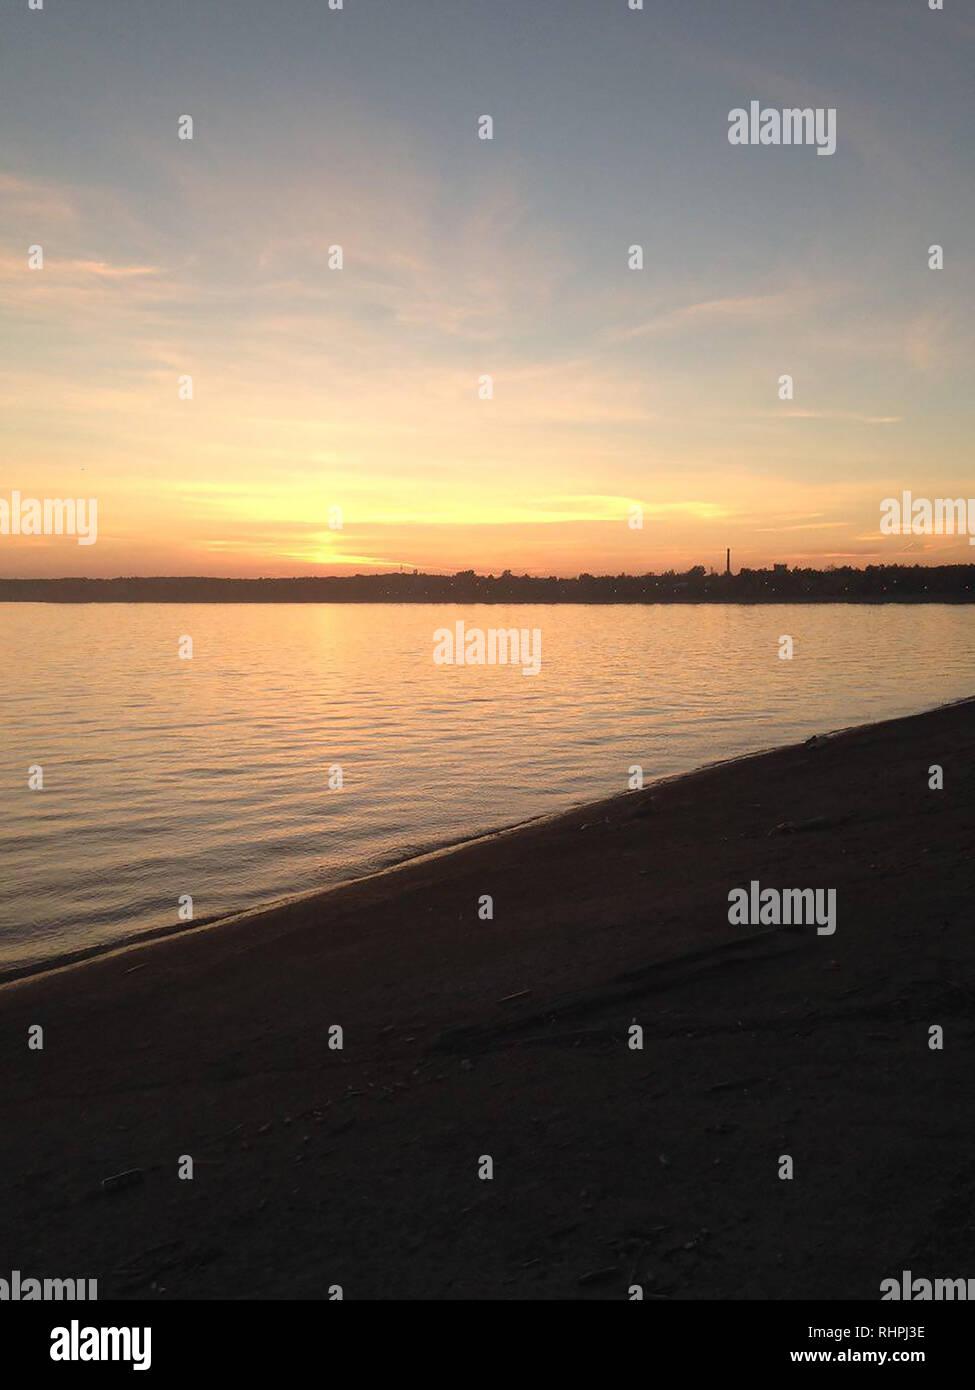 sea sun and horizont mobile photography - Stock Image